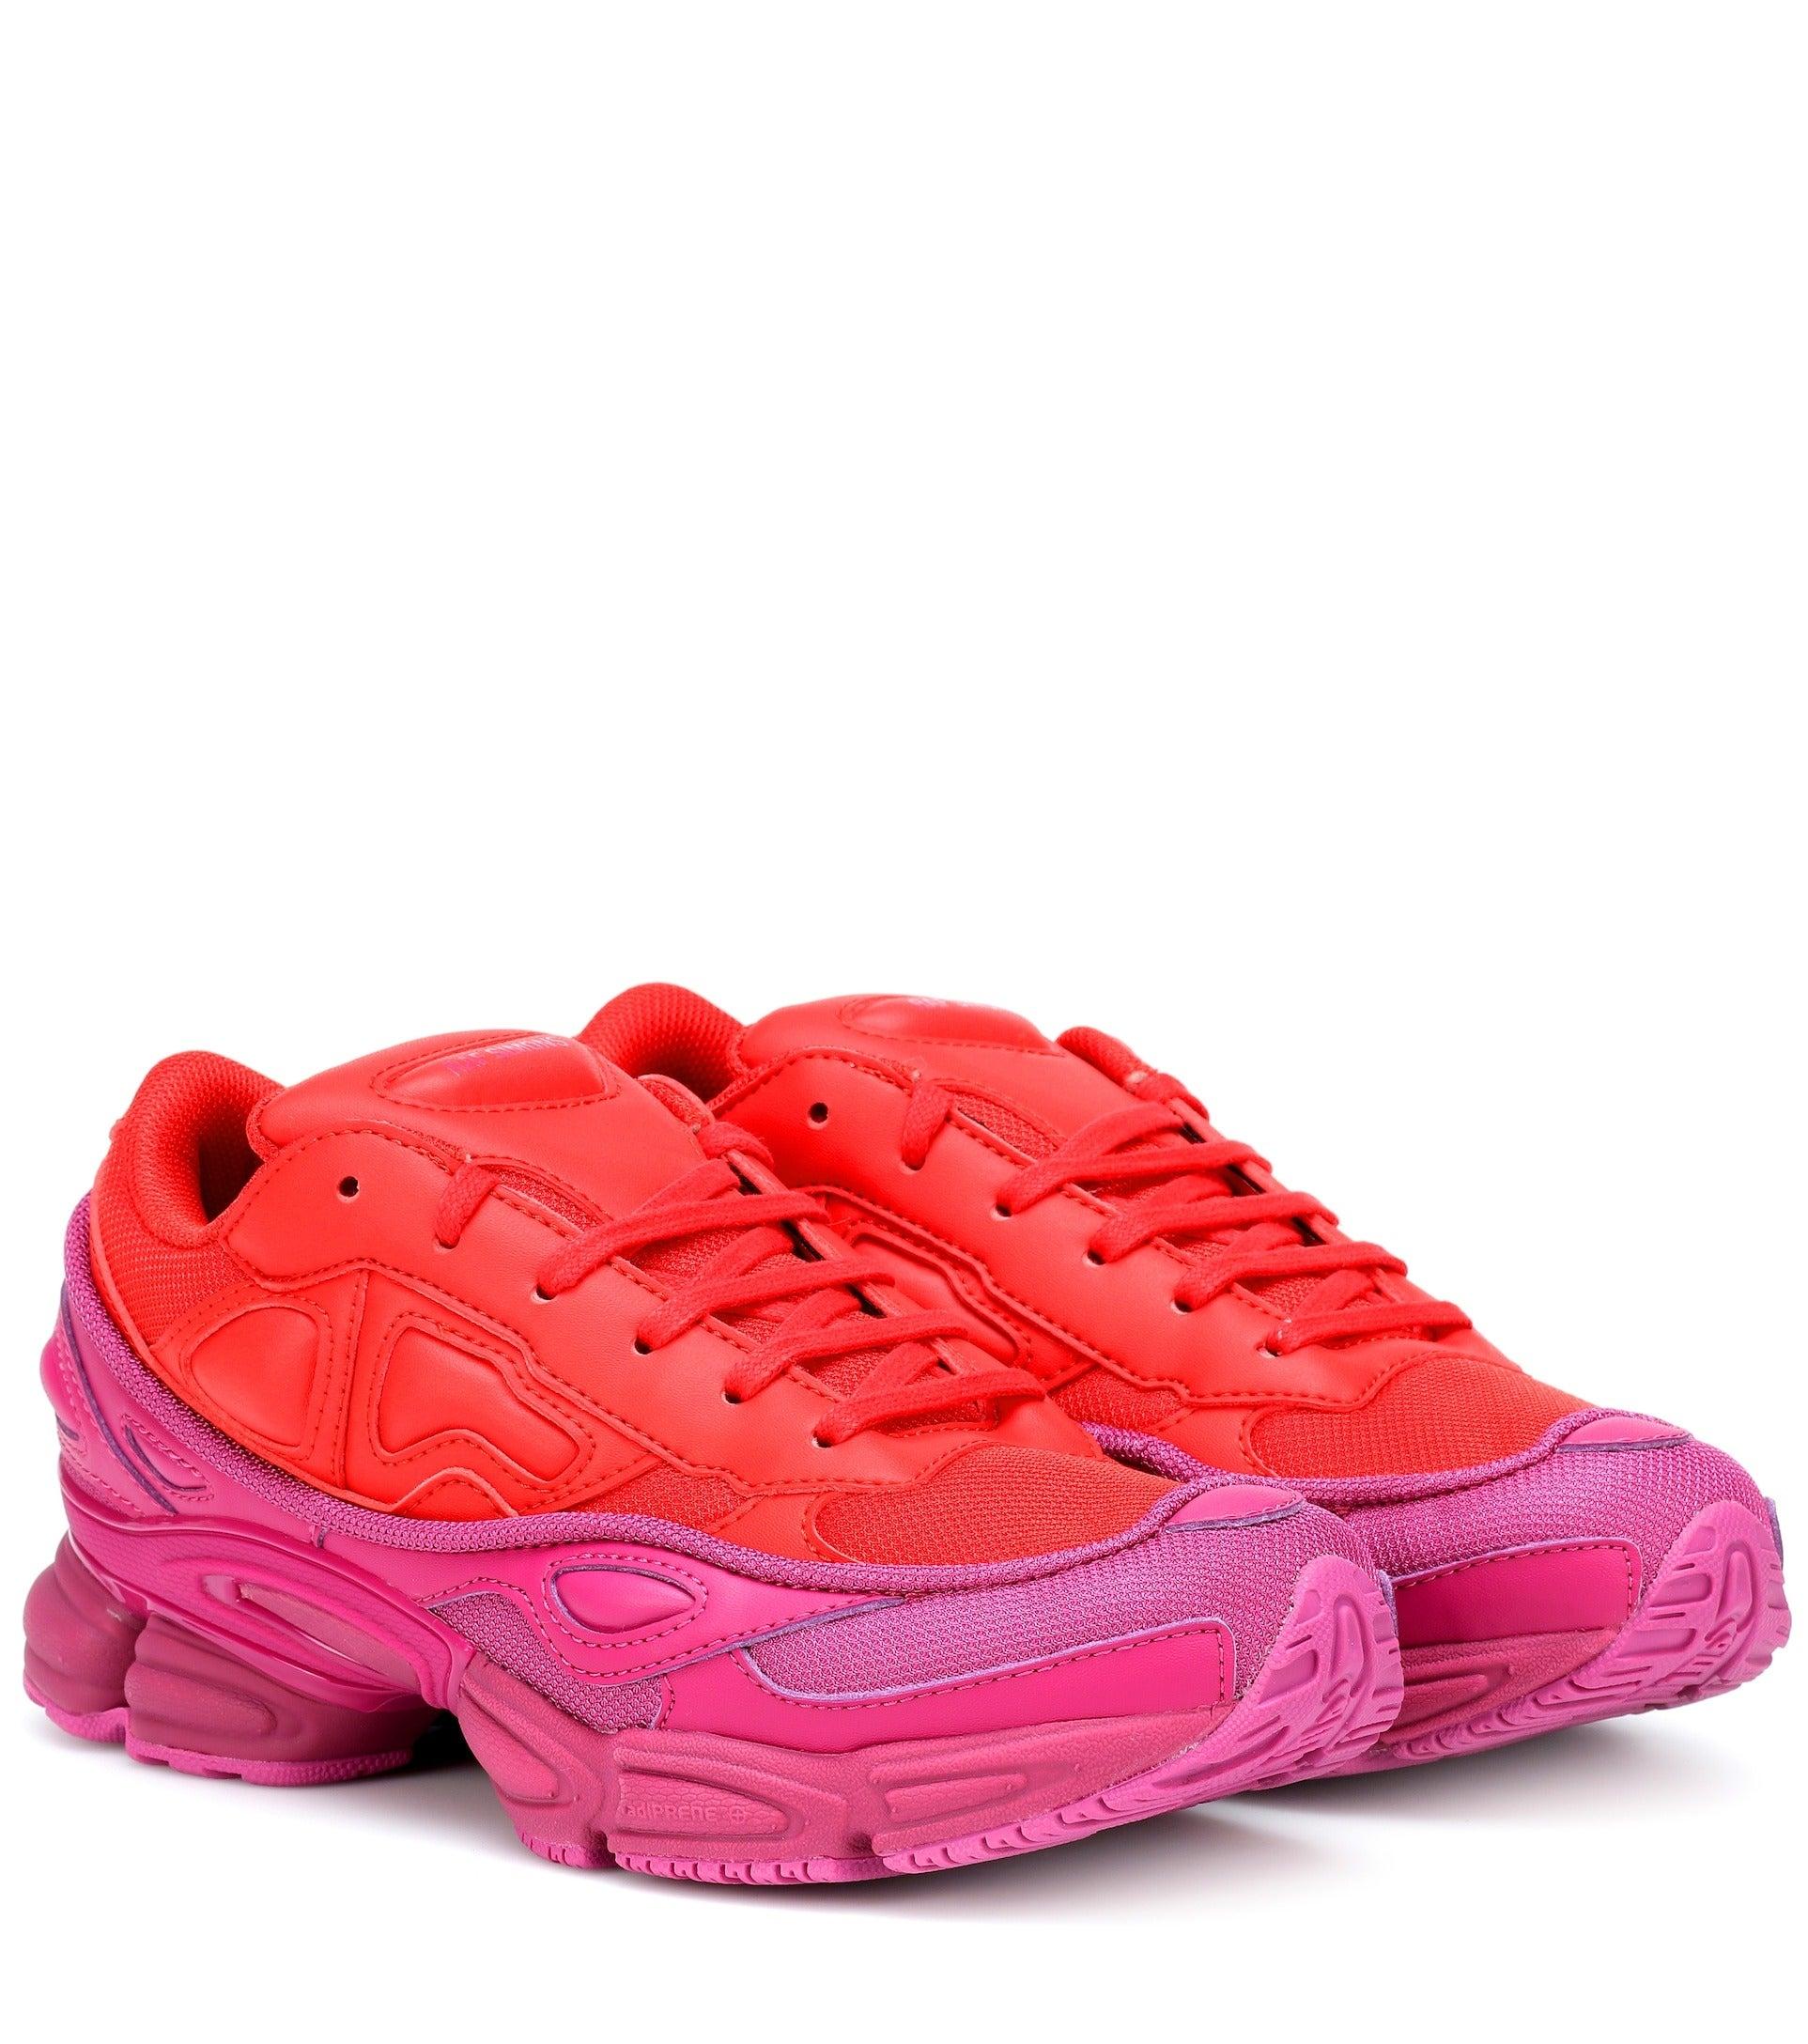 Adidas by Raf Simons + RS Ozweego Sneakers